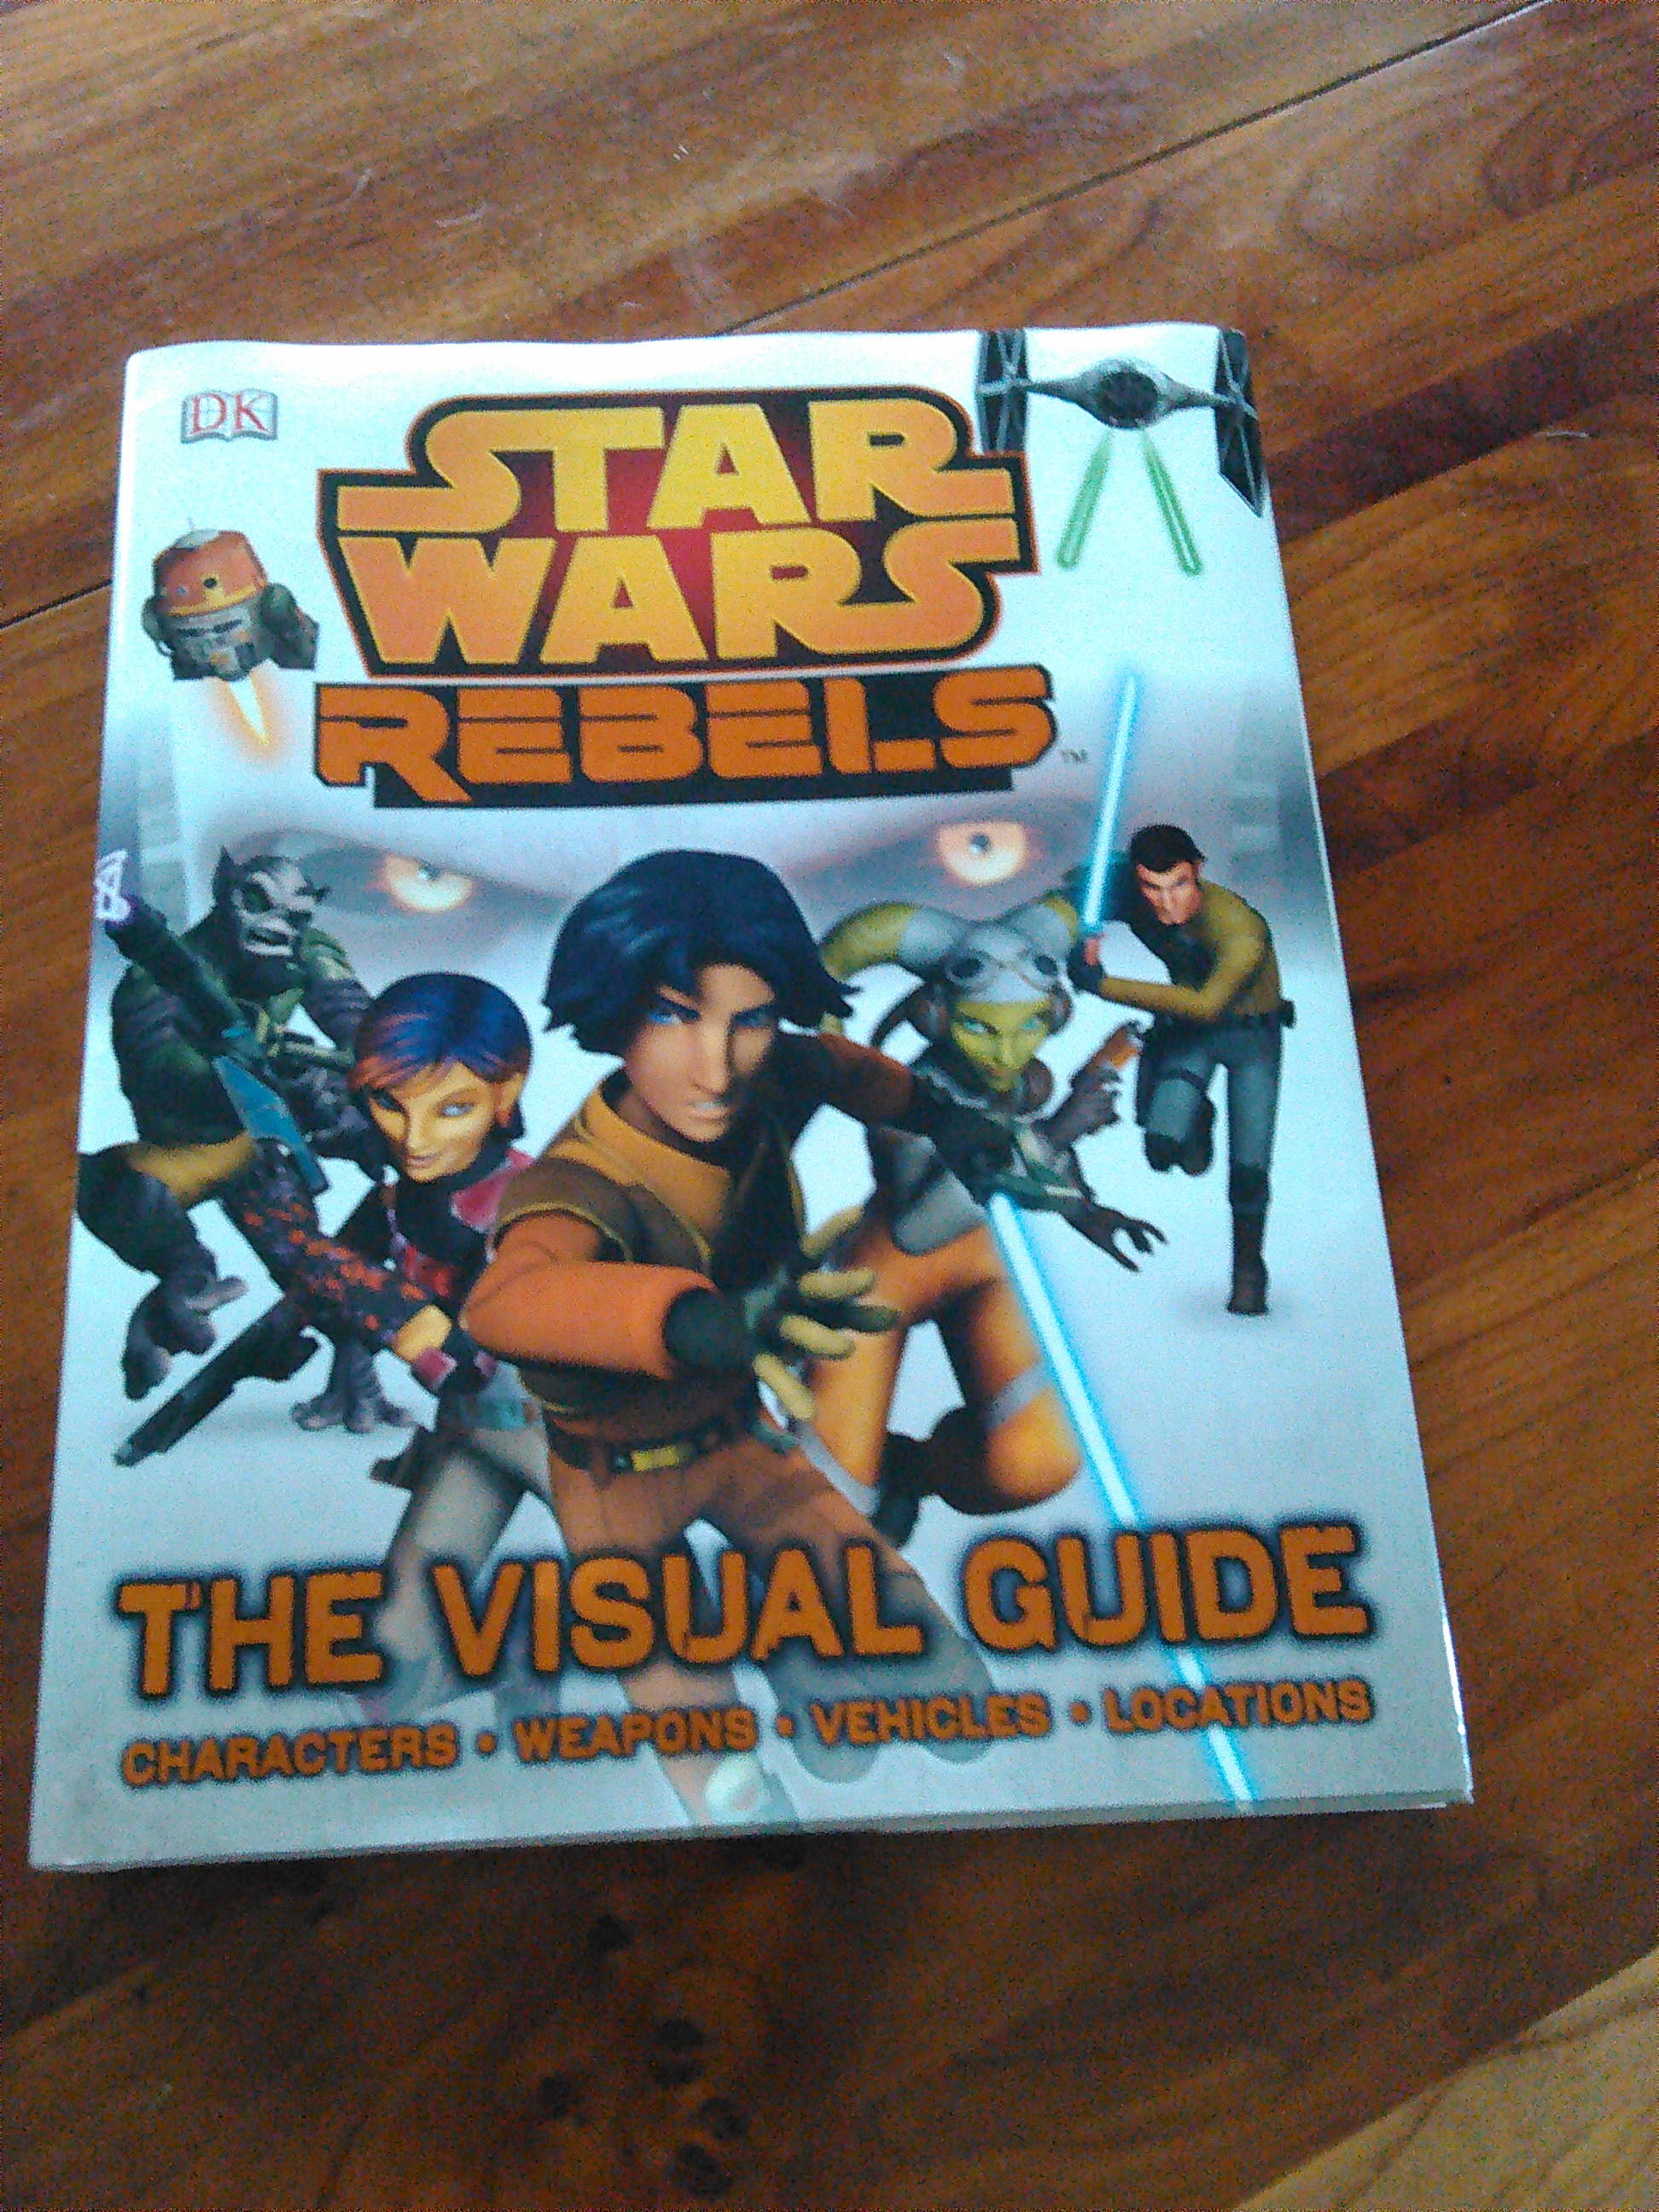 Star Wars Rebels Images Star Wars Rebels The Visual Guide Hd